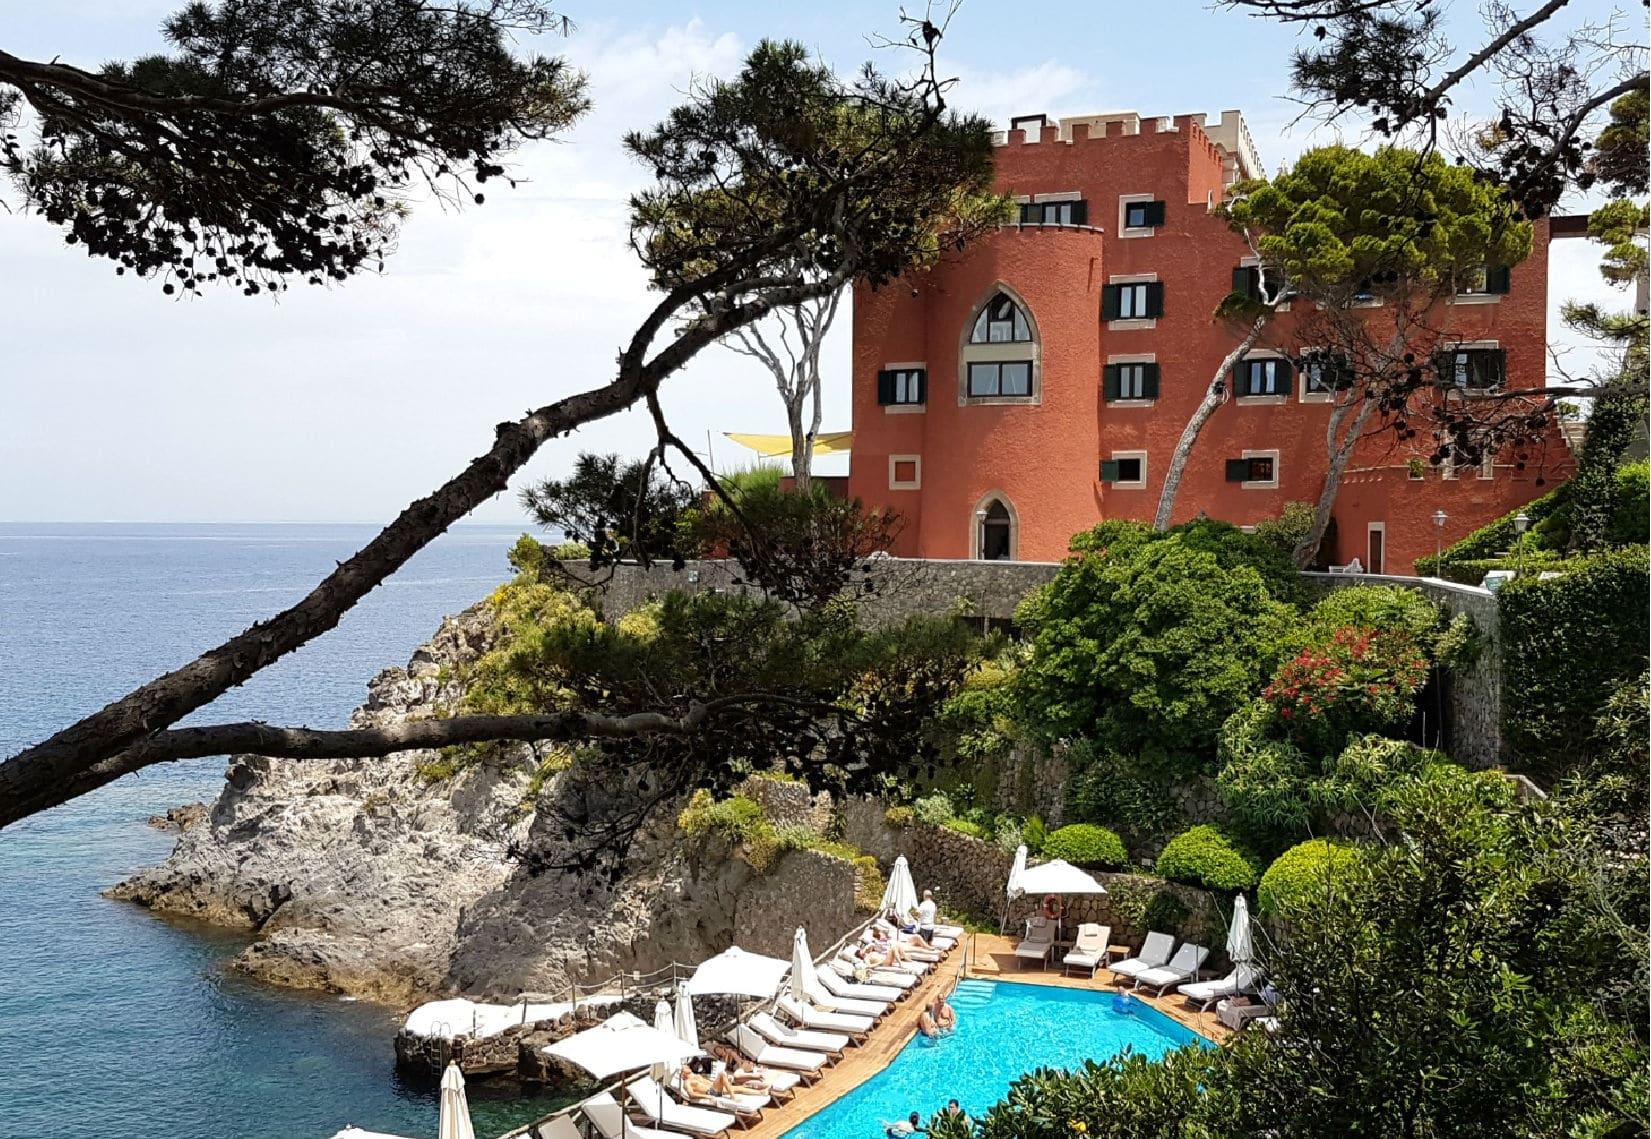 Hotel em Ischia: Mezzatorre Resort & Spa